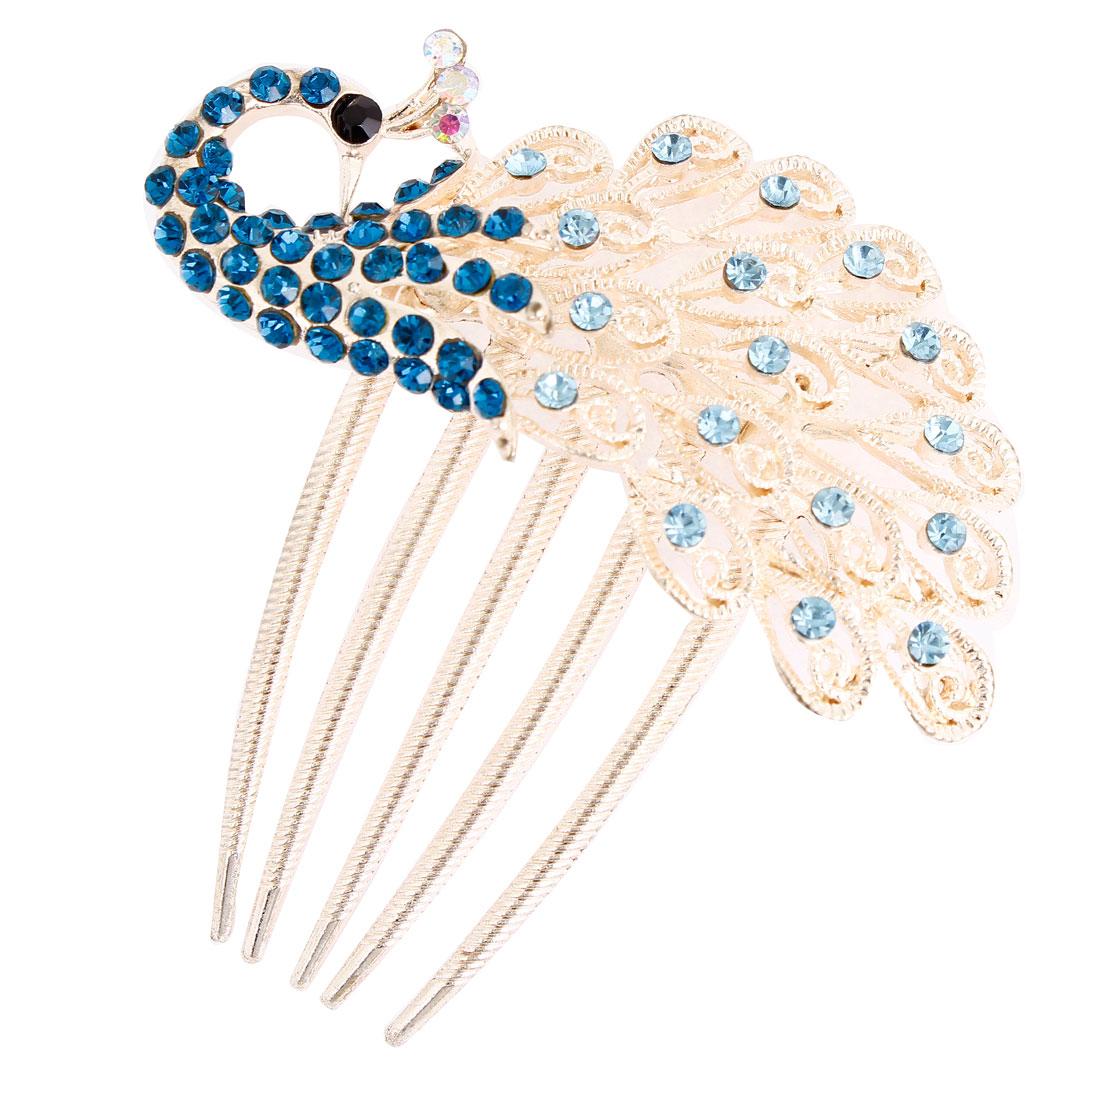 Blue Sparkling Faux Rhinestones Inlaid Peafowl Hair Comb Clip Claw Gold Tone